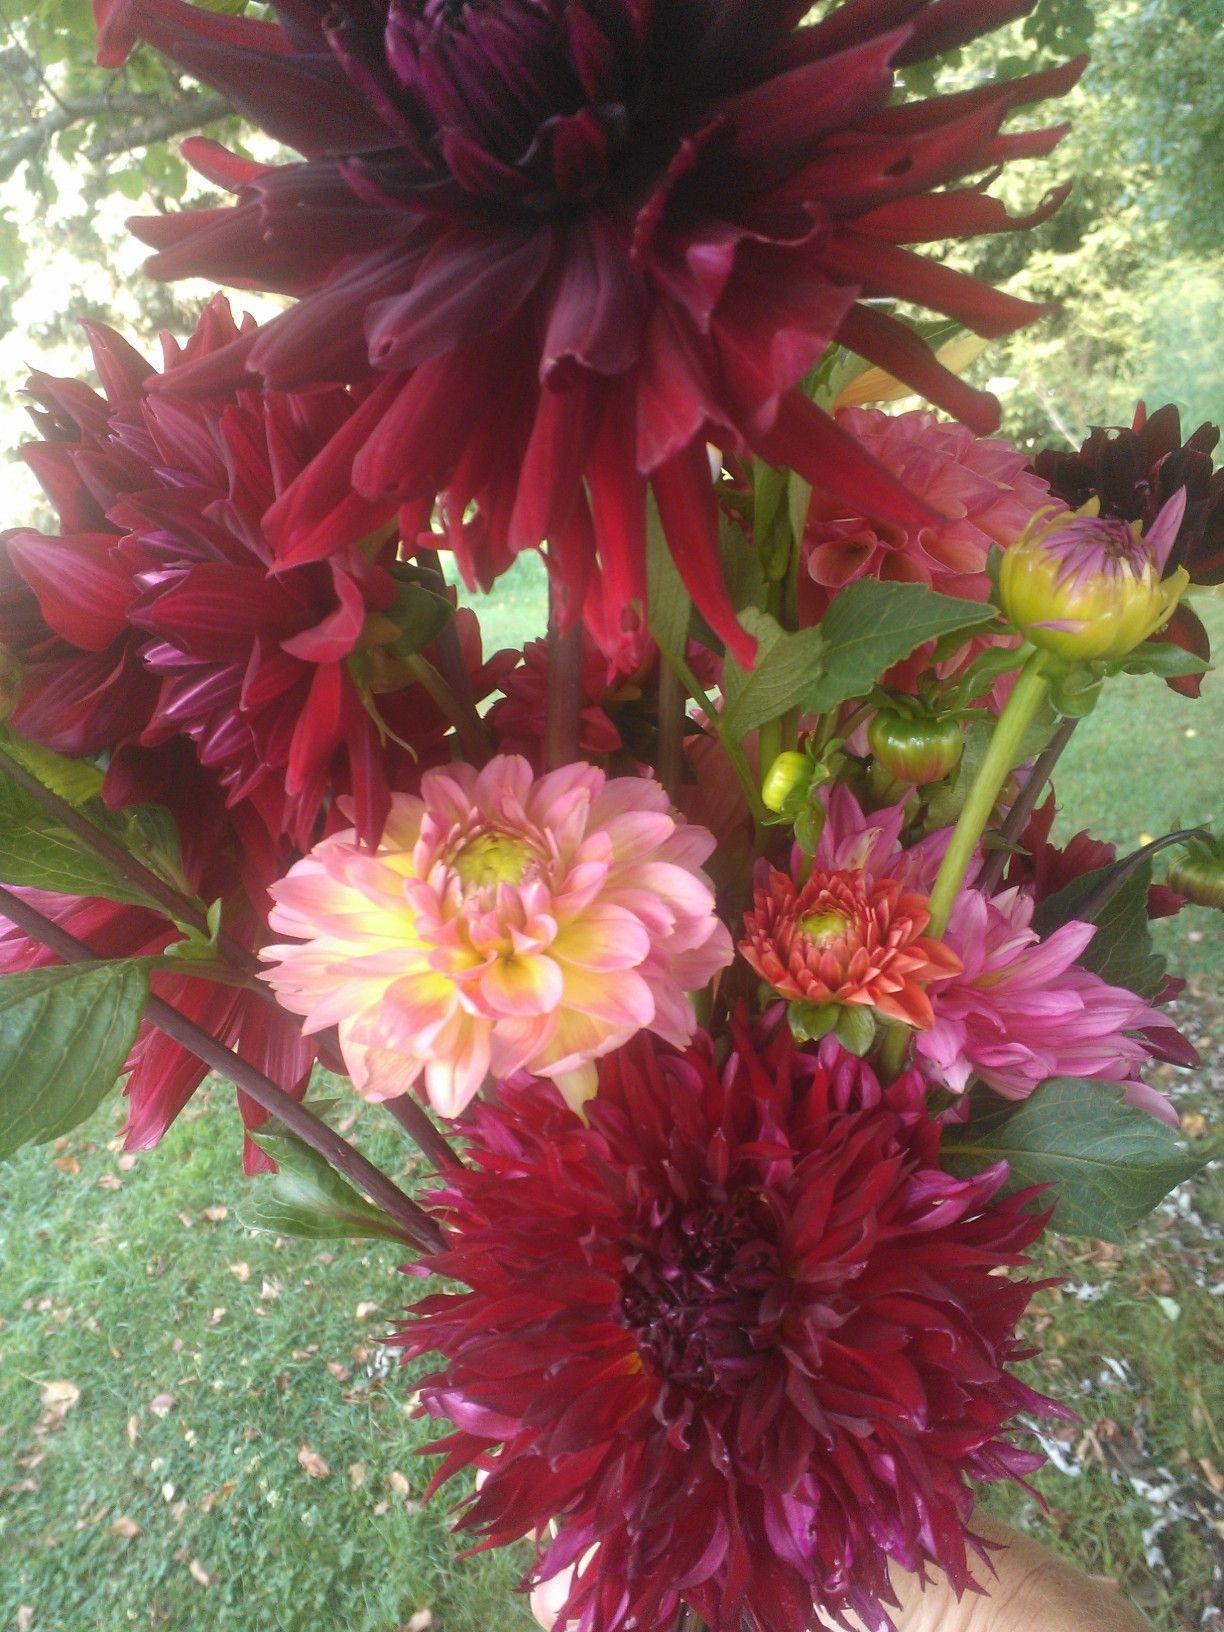 Dahlias mediumtall 12 18 burgundy mix colors 1500bunch dahlias mediumtall 12 18 burgundy mix colors izmirmasajfo